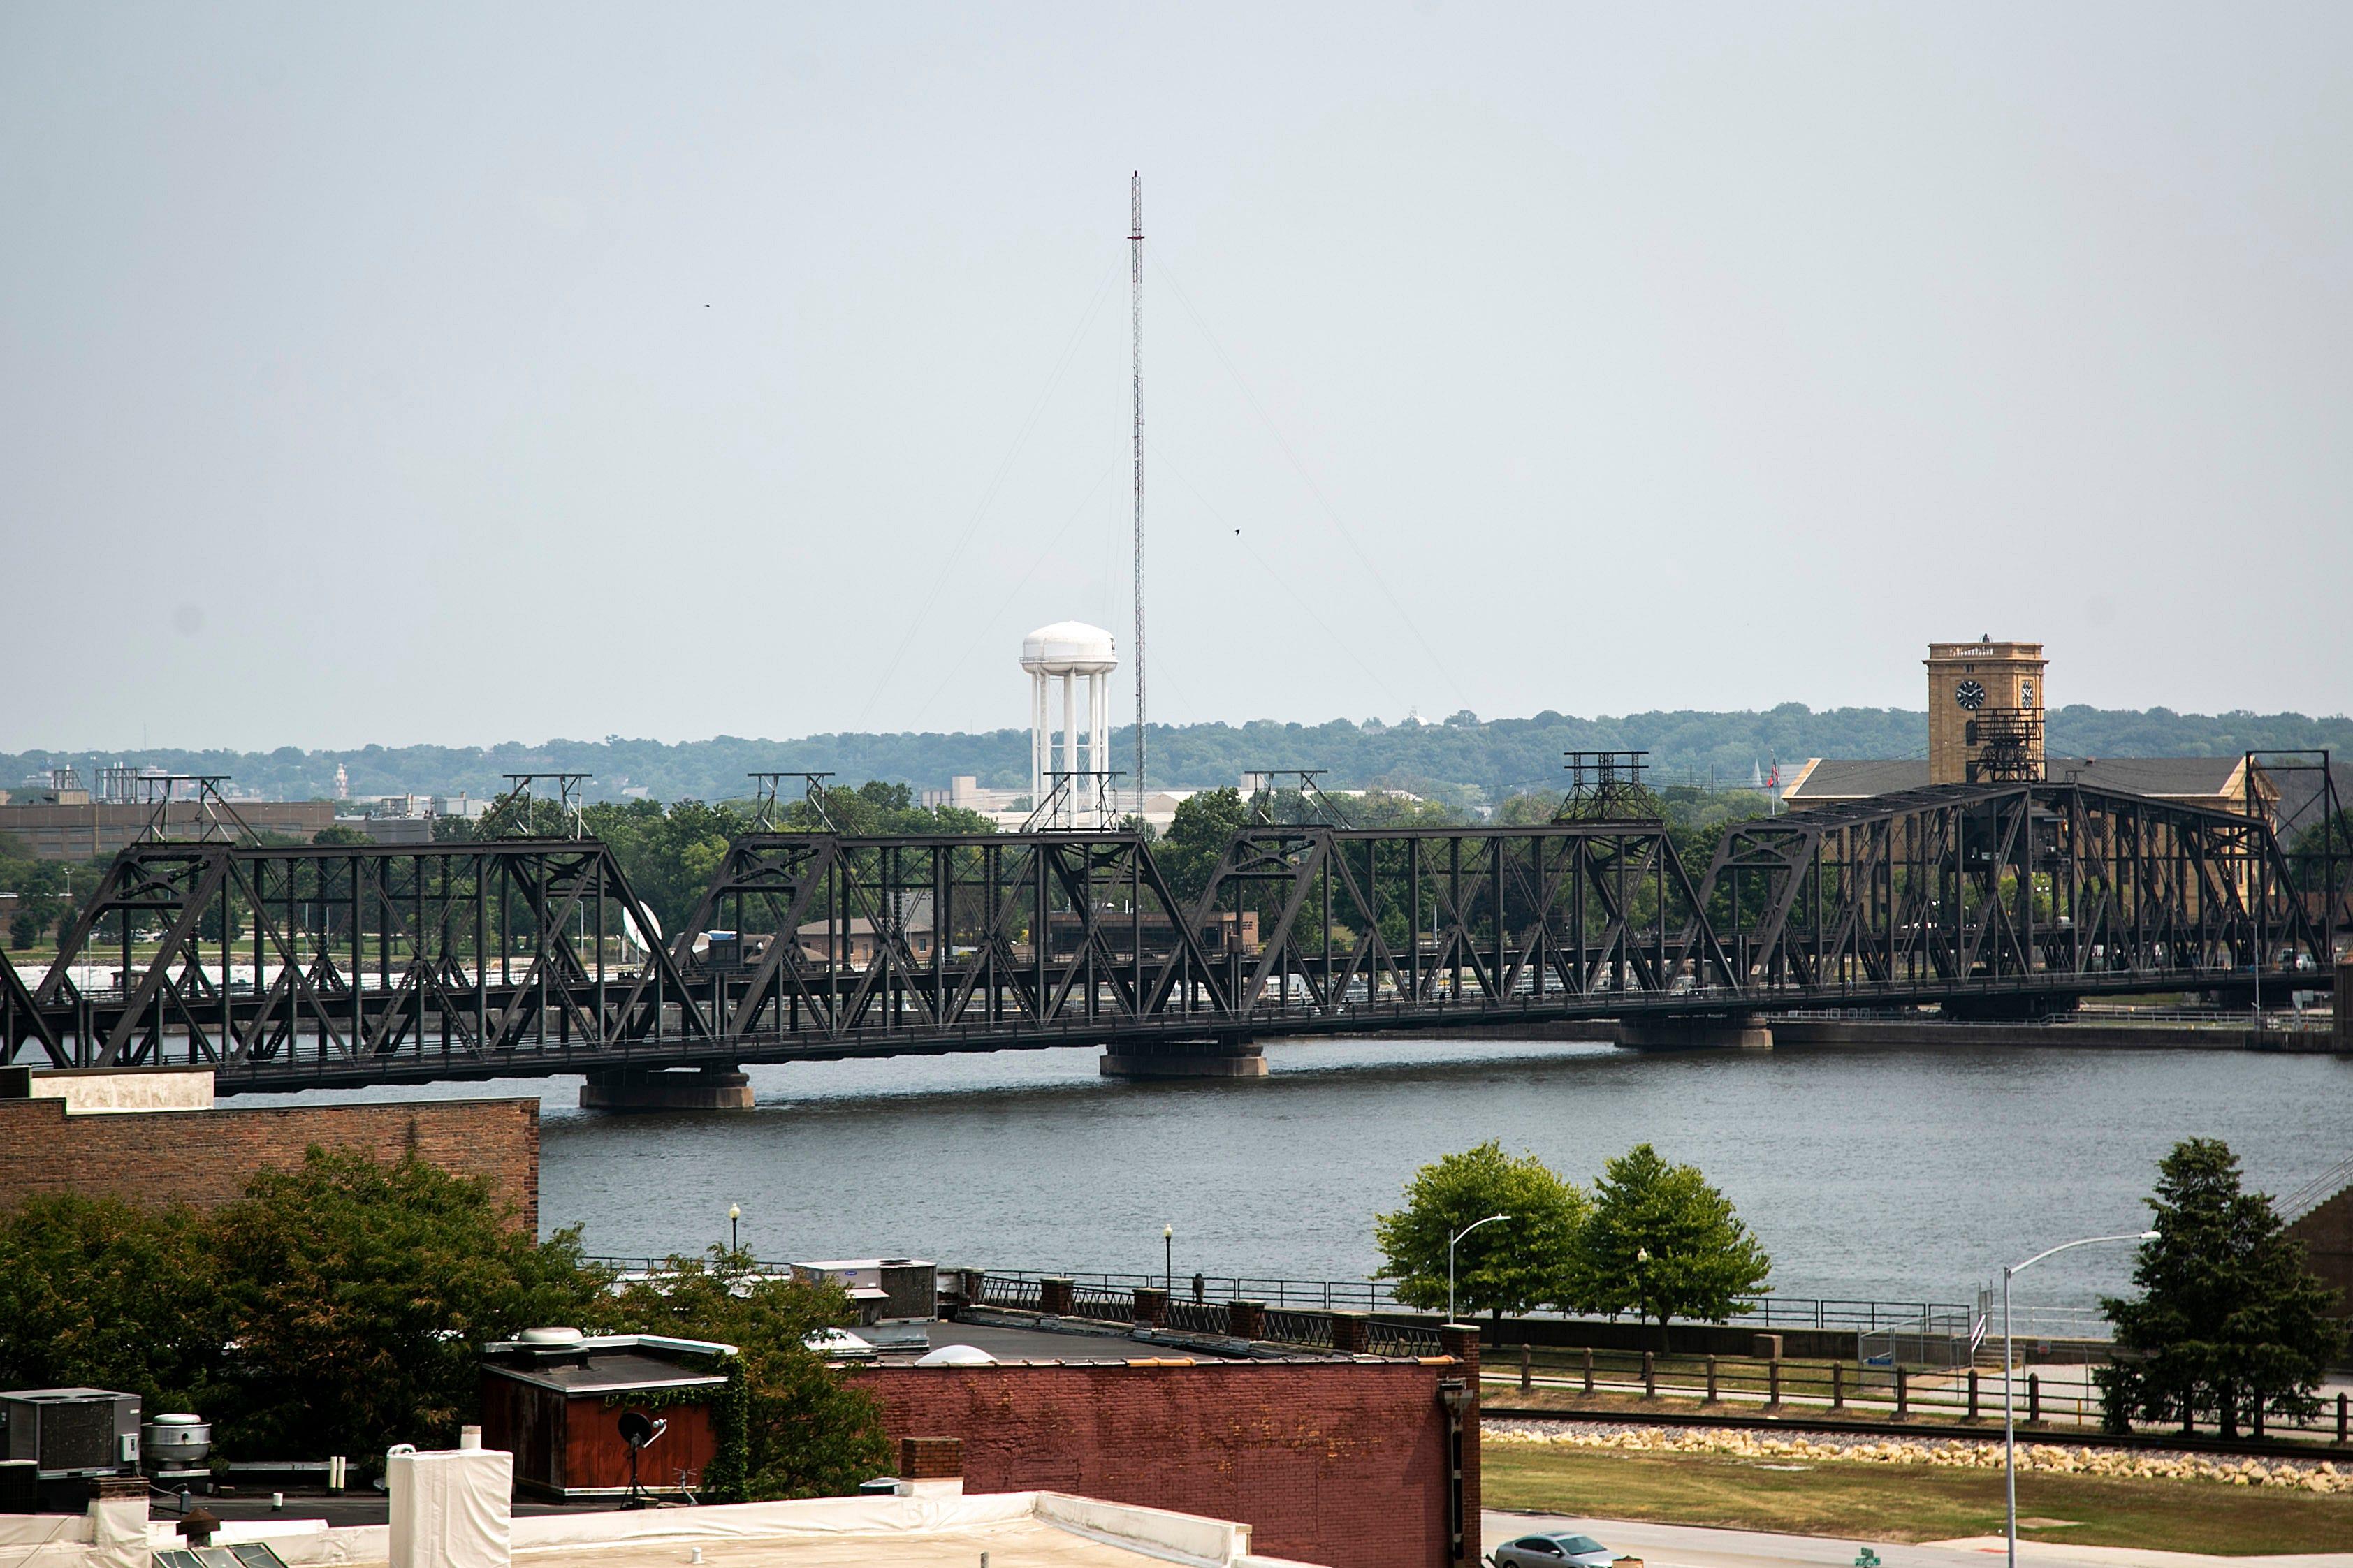 Mississippi River in Davenport, Iowa.